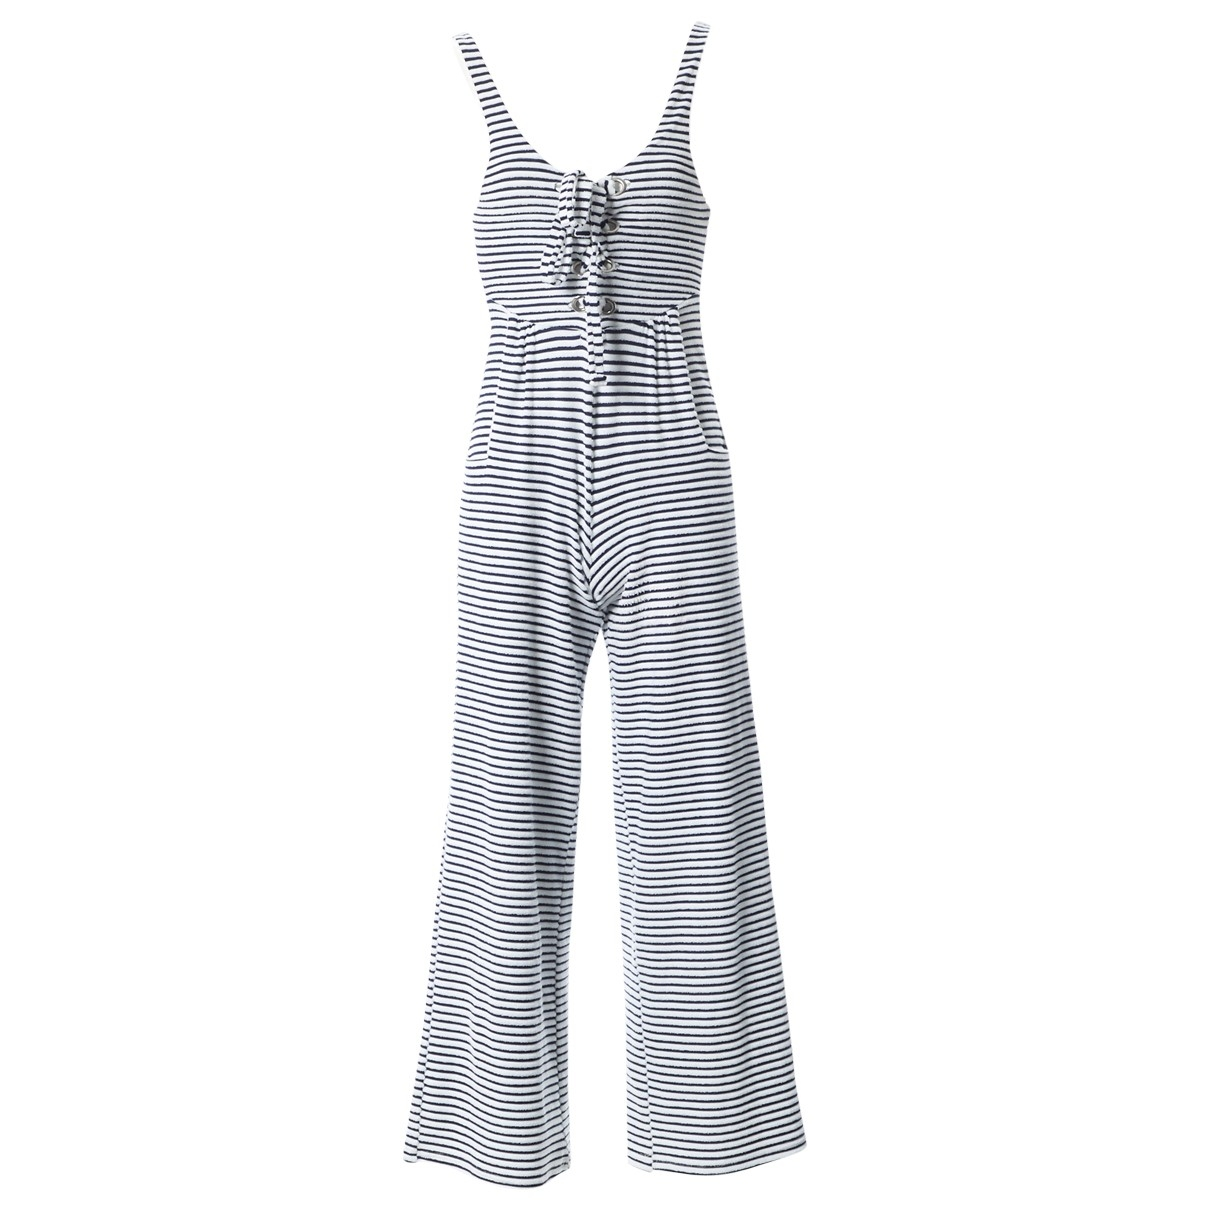 Mara Hoffman \N White Cotton jumpsuit for Women XS International